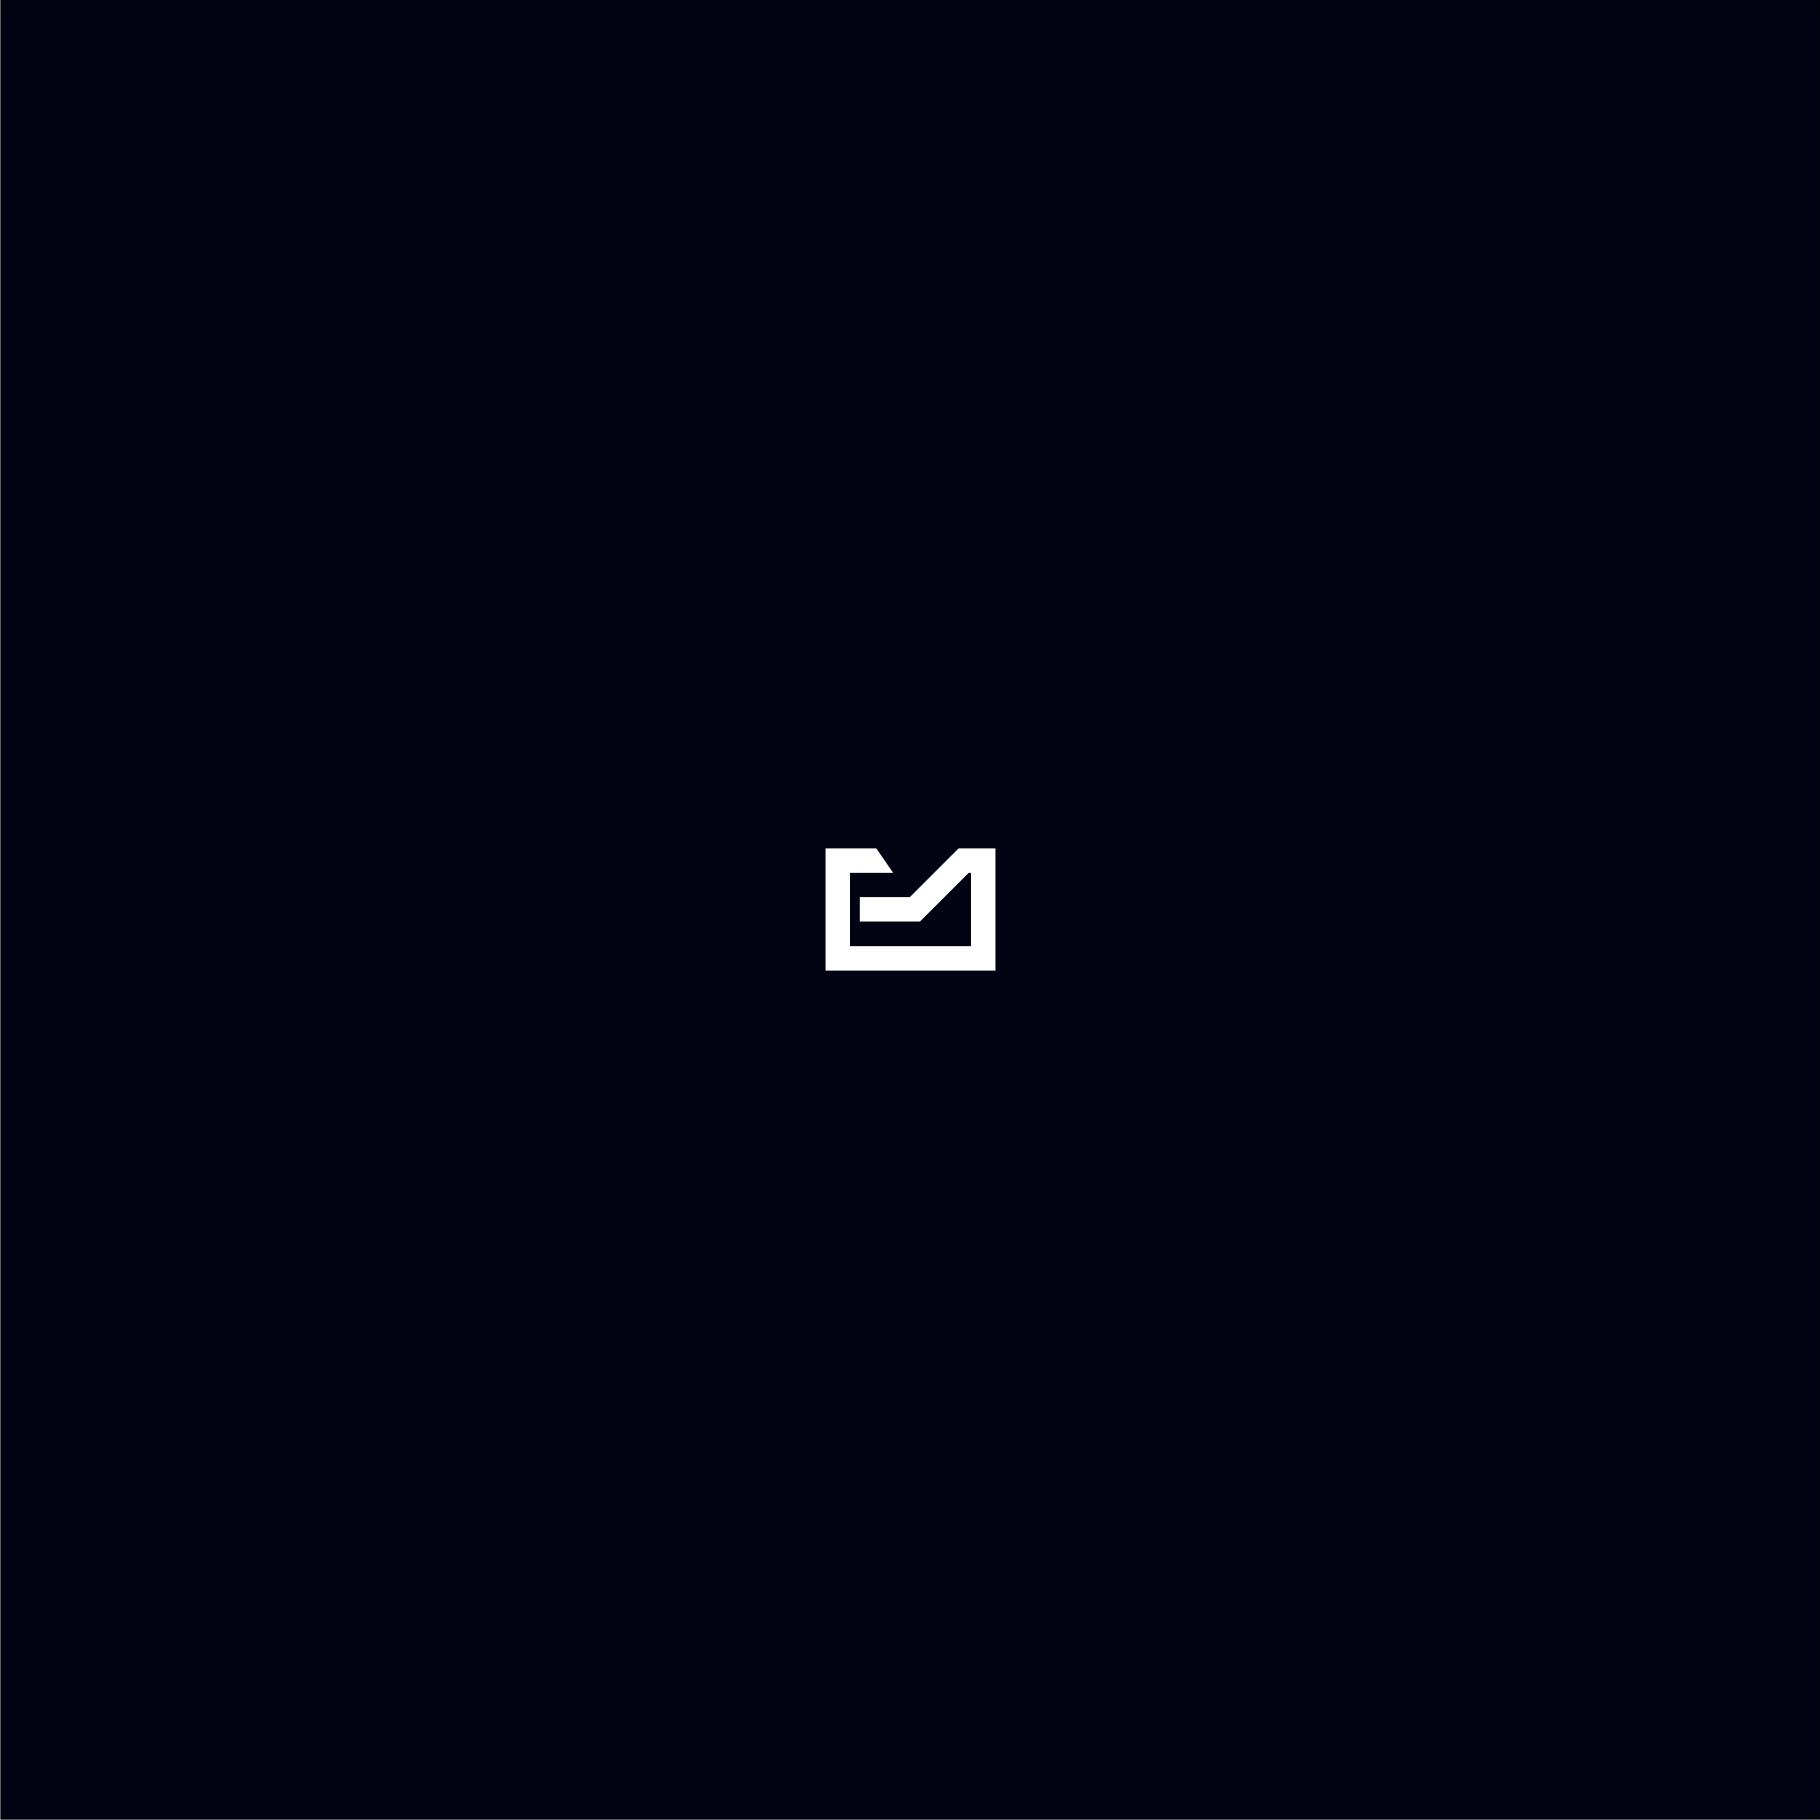 Логотип для новостного сайта  фото f_8725b6c265628d64.png